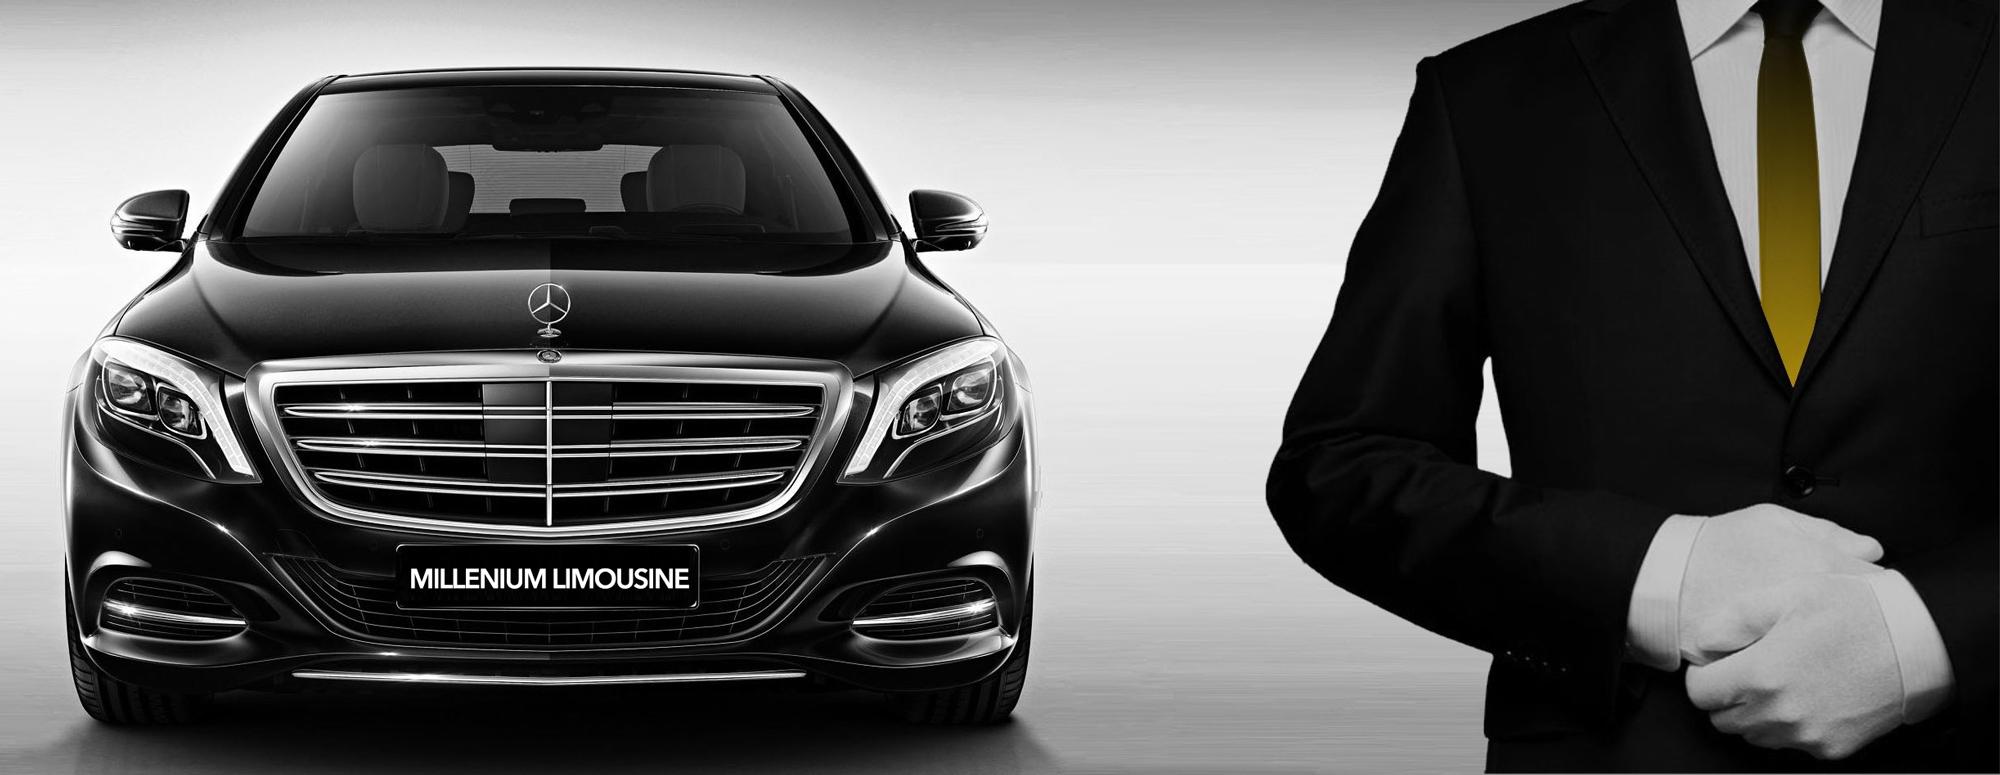 Limousine-Service9_B